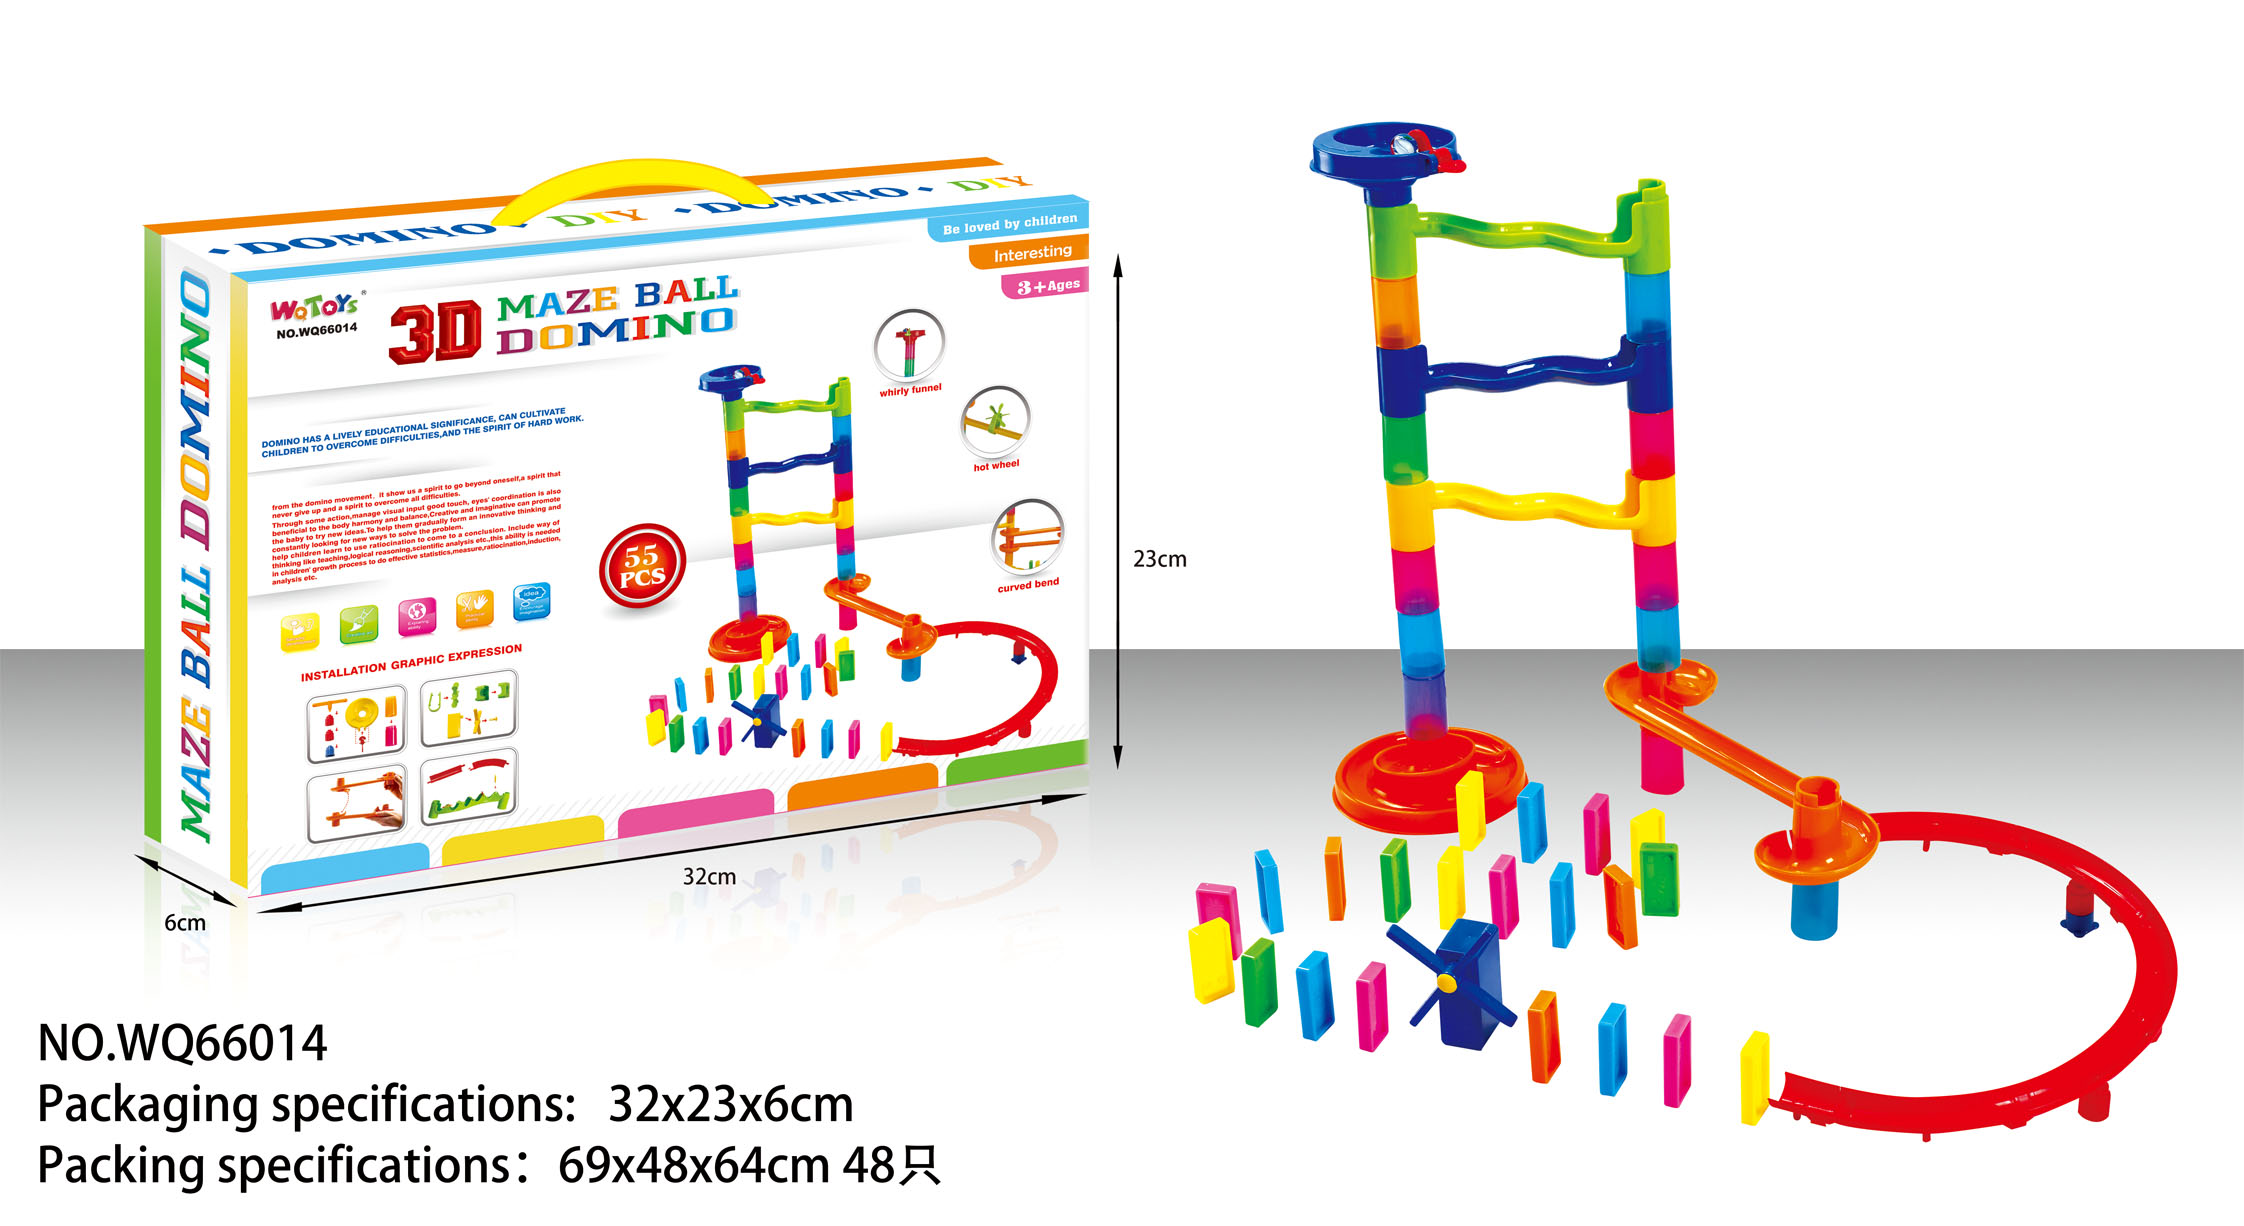 domino intelligence game 106pcs 3d maze ball plastict educational toys